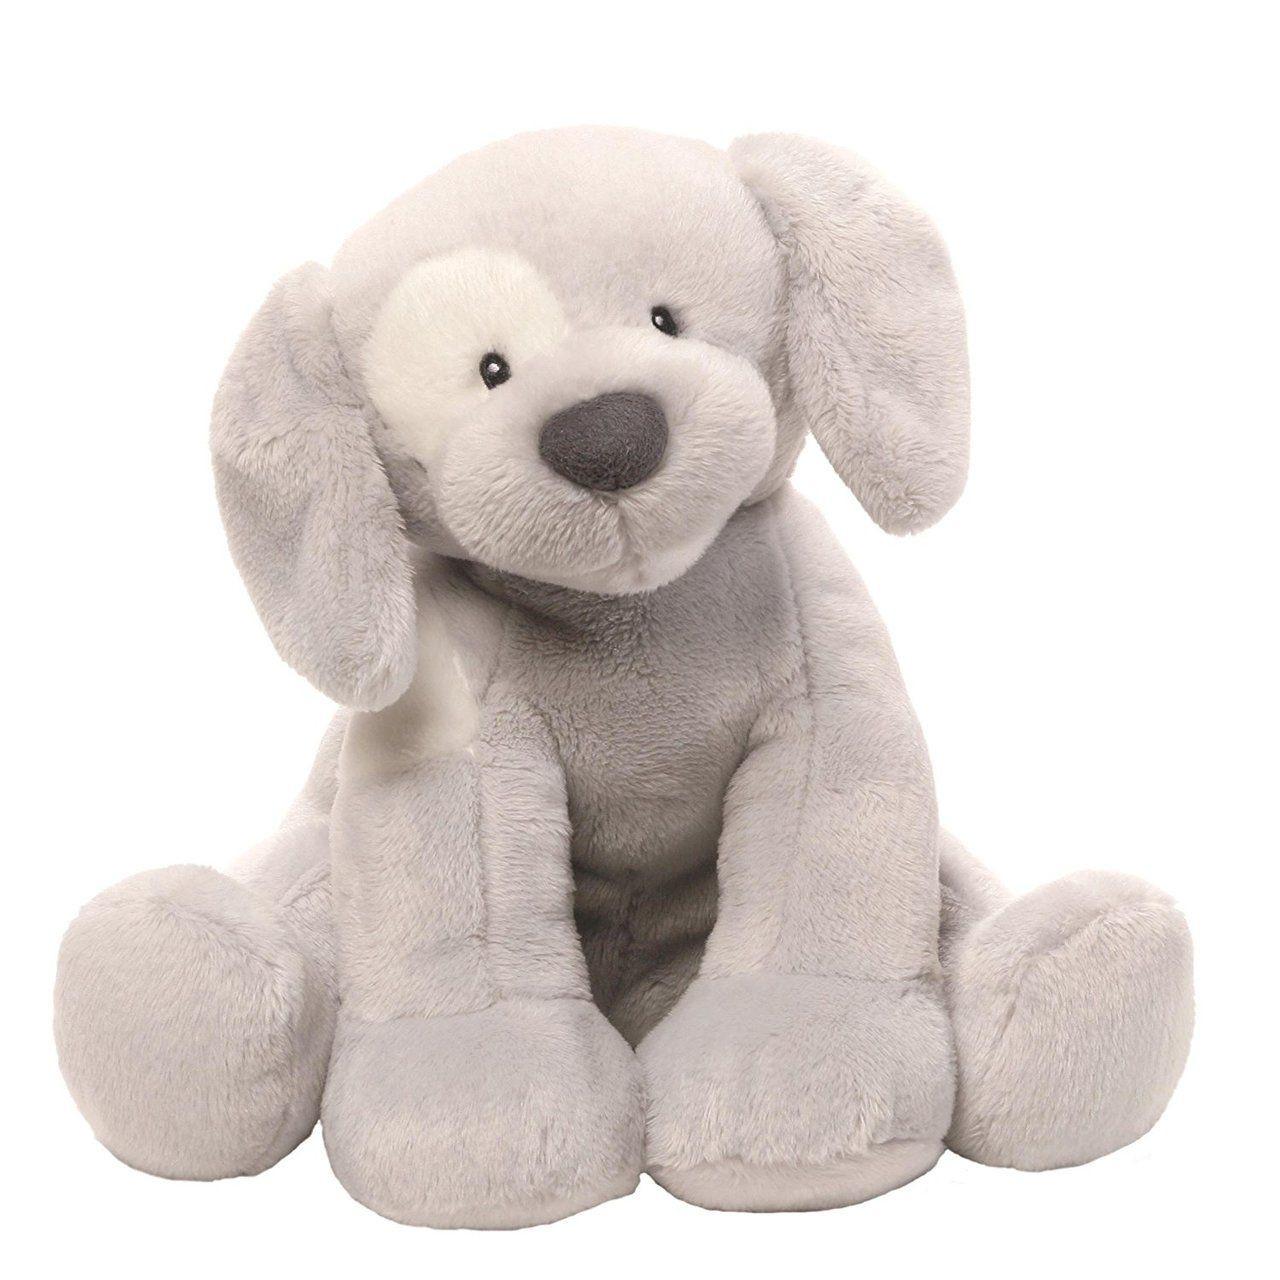 Baby GUND Spunky Dog Stuffed Animal Plush Sound Toy 47d7dc3c1